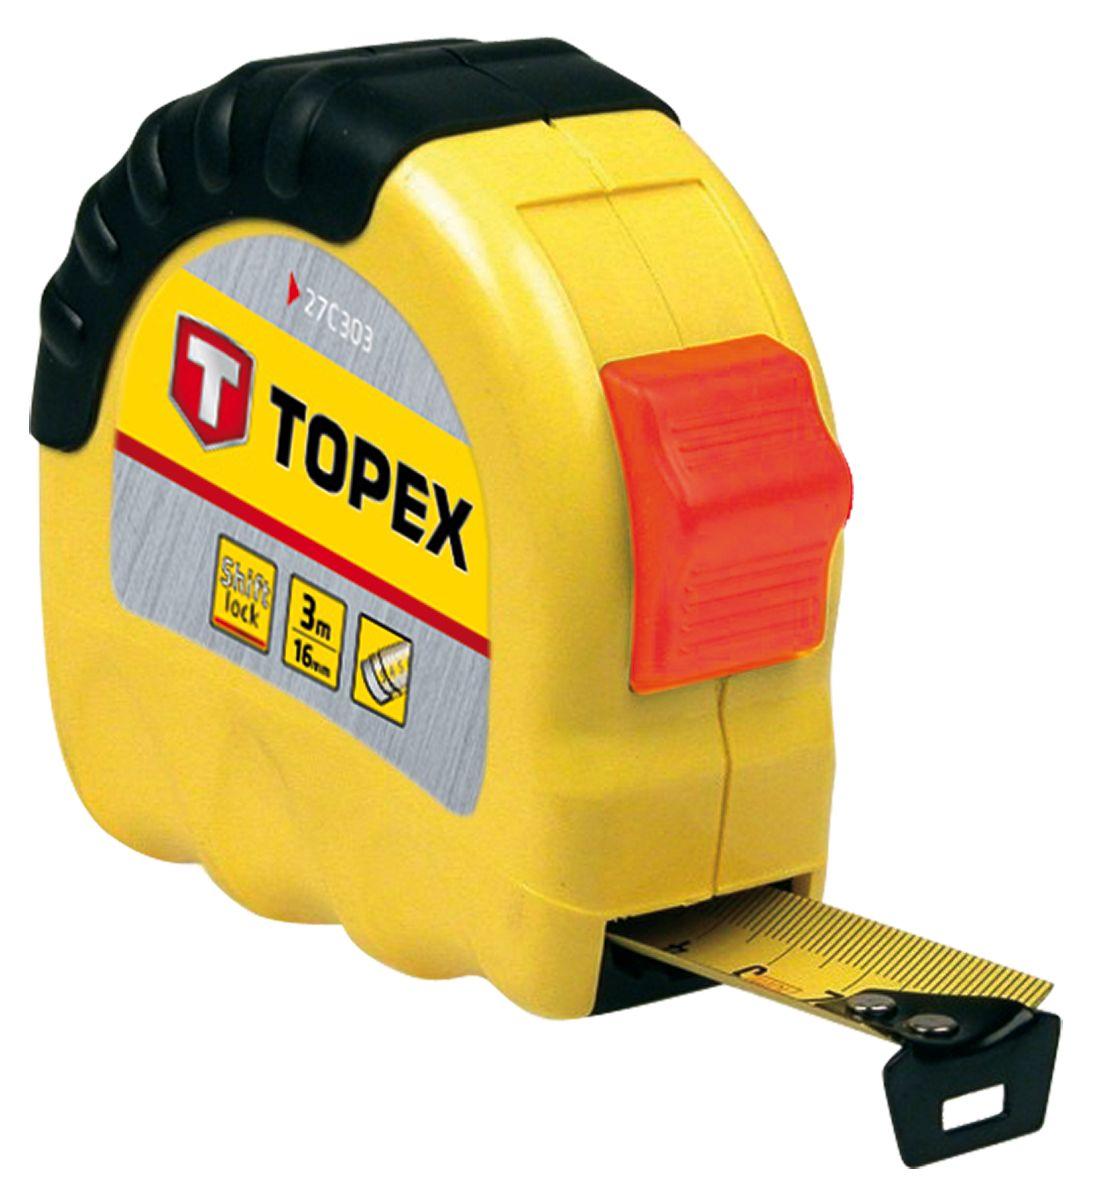 ������� Topex�������<br>����� (�): 8,<br>������: 25,<br>��� �������: �������<br>